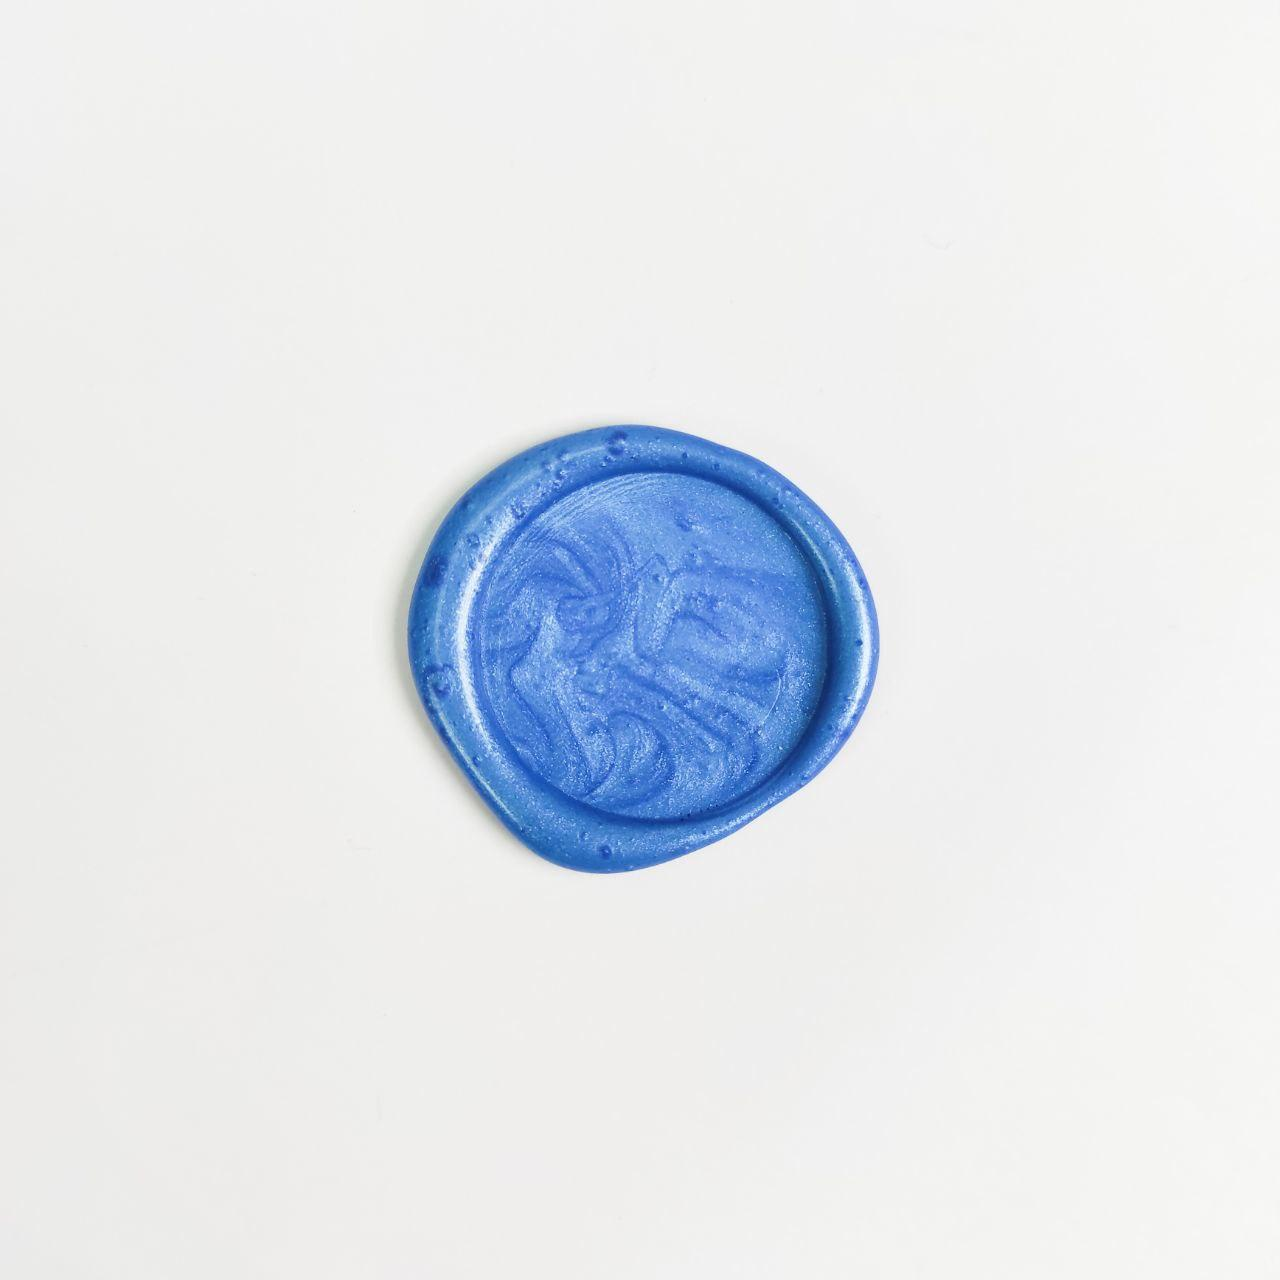 Декоративный сургуч. Цвет - Синий.